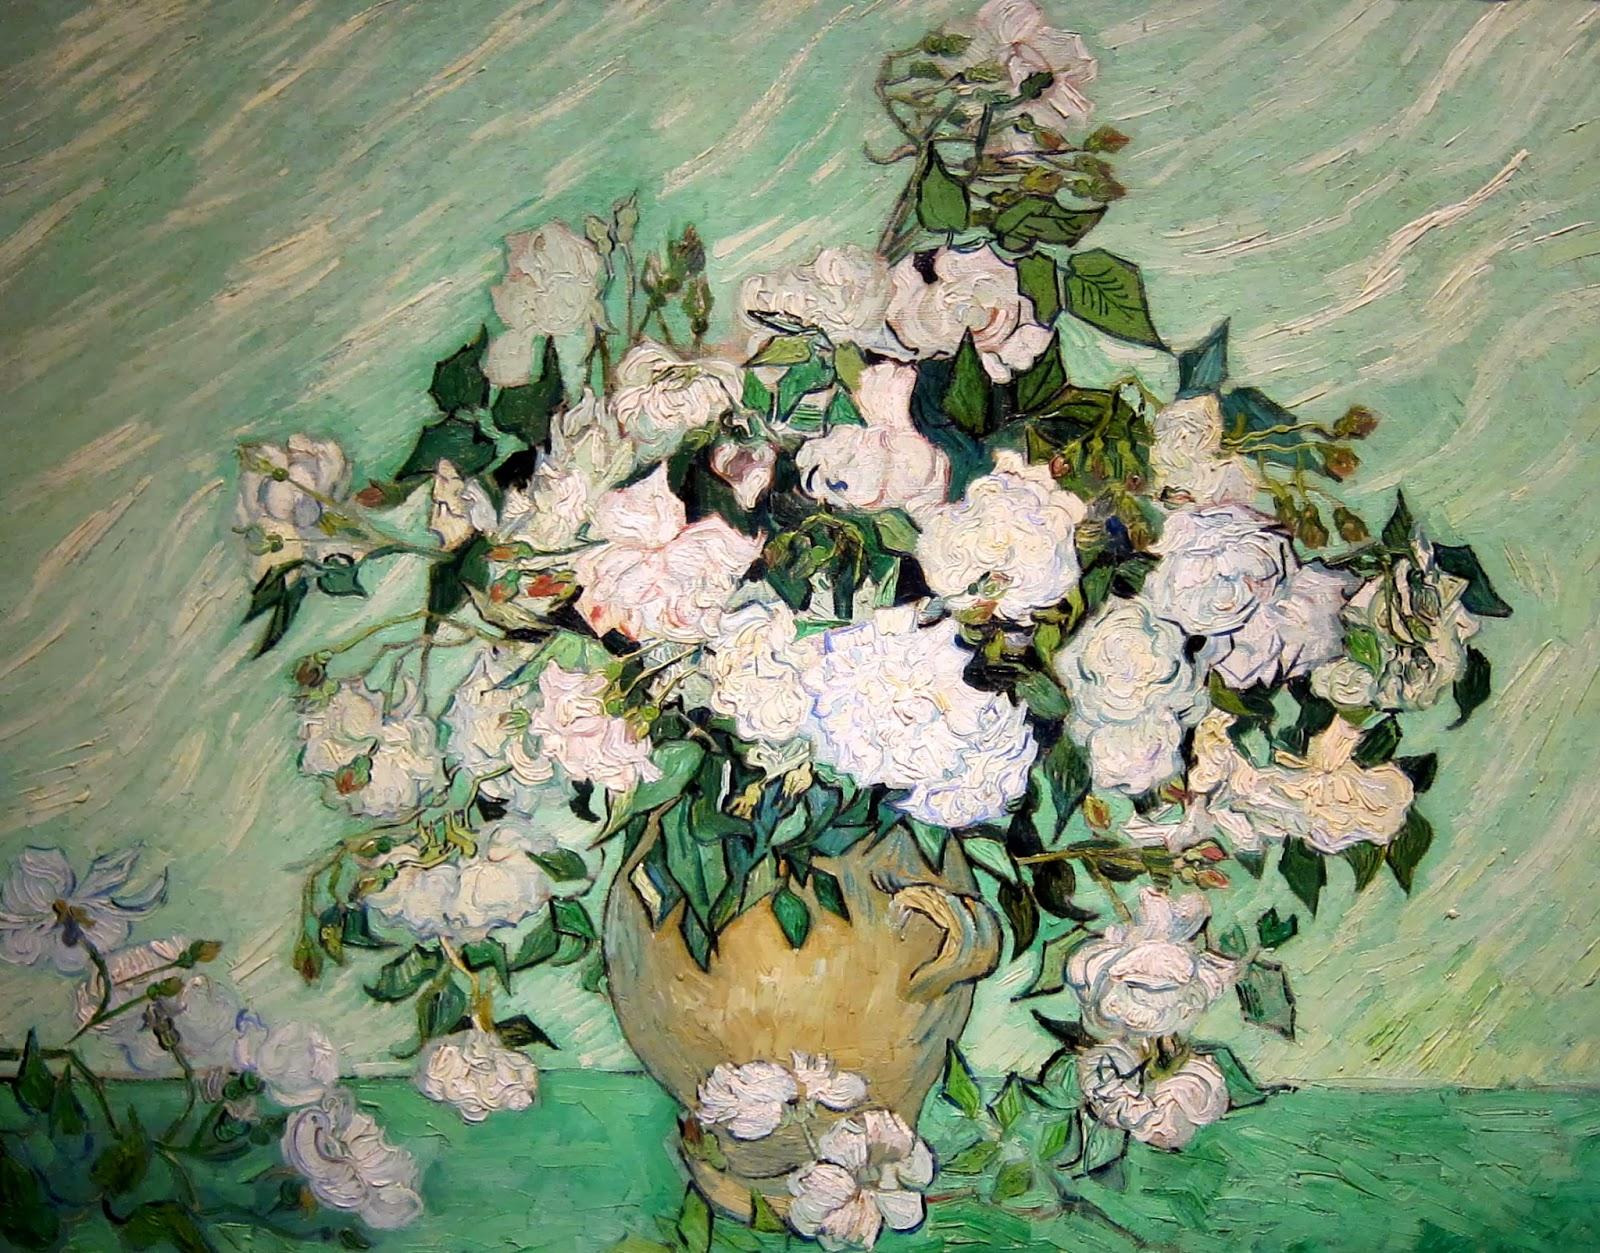 Marie Dauenheimer S Art And Anatomy Blog Vincent Van Gogh